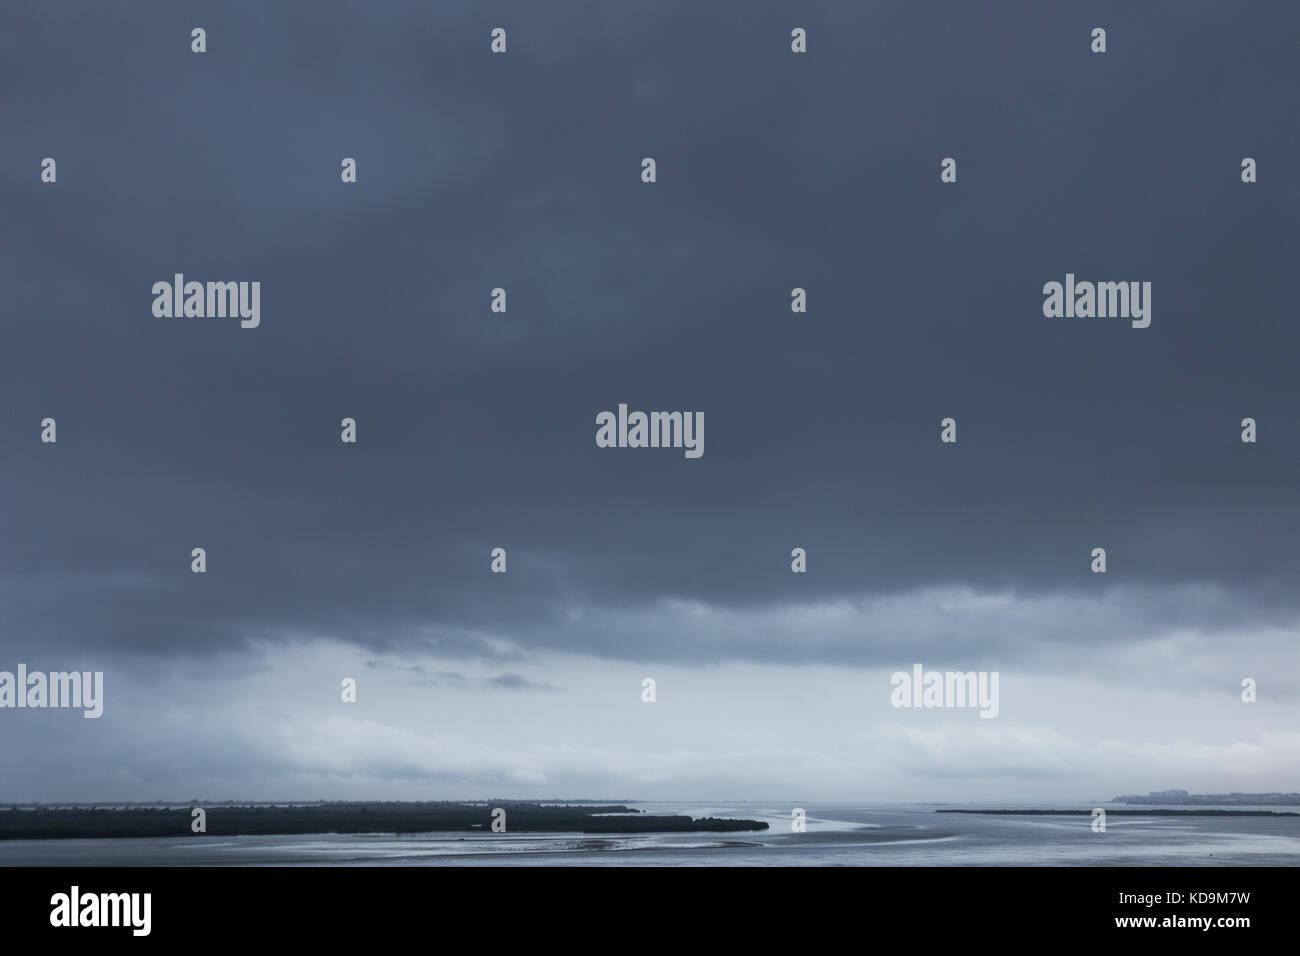 Maritim storm coming to mussulo island, Luanda, Angola - Stock Image